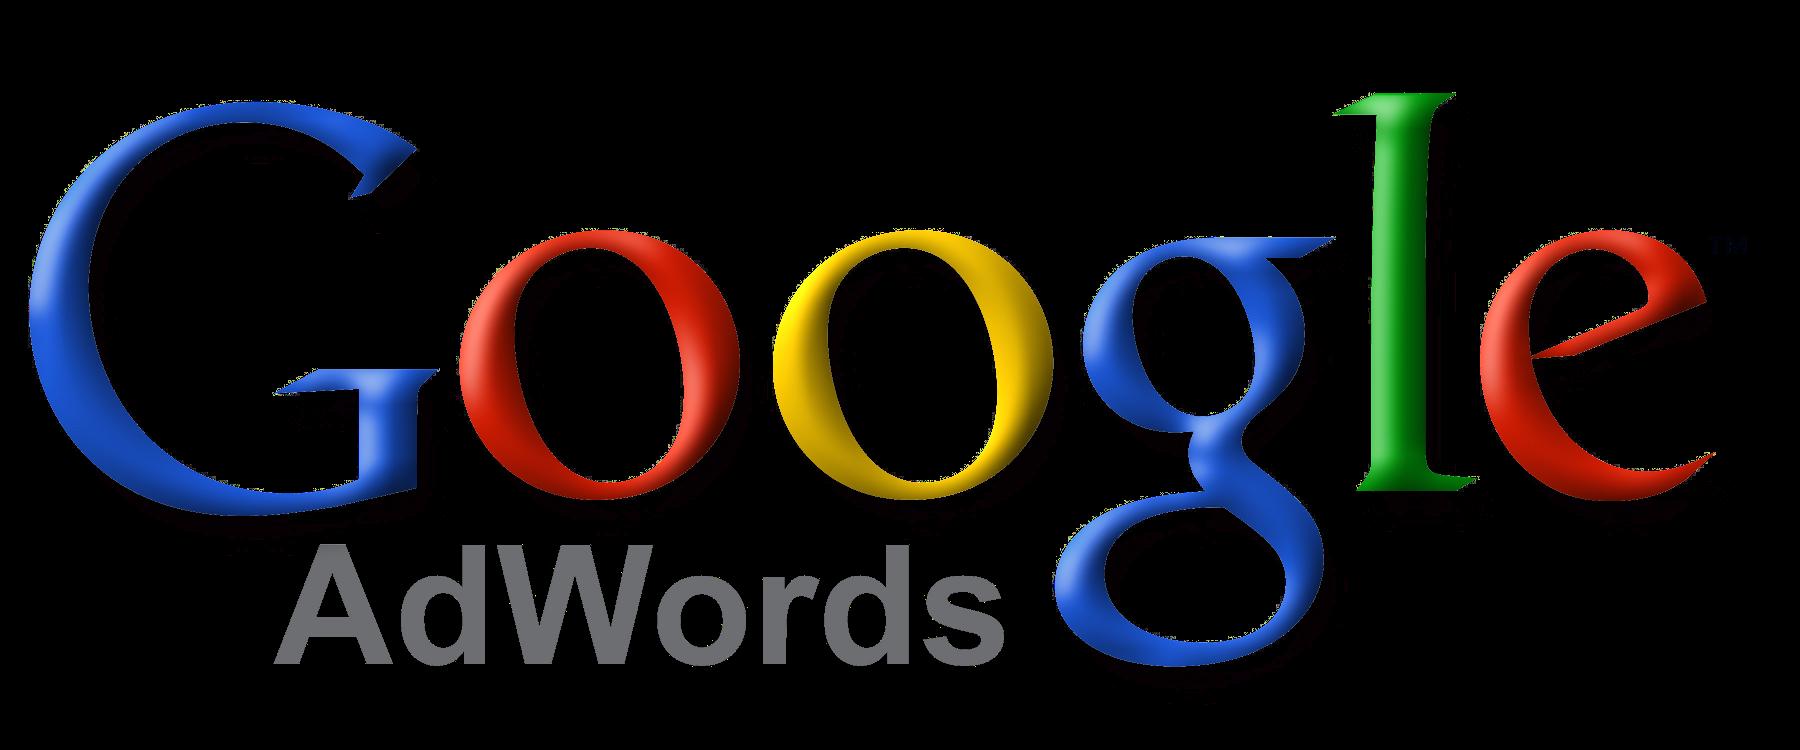 Google Adwords Logo PNG - 34145